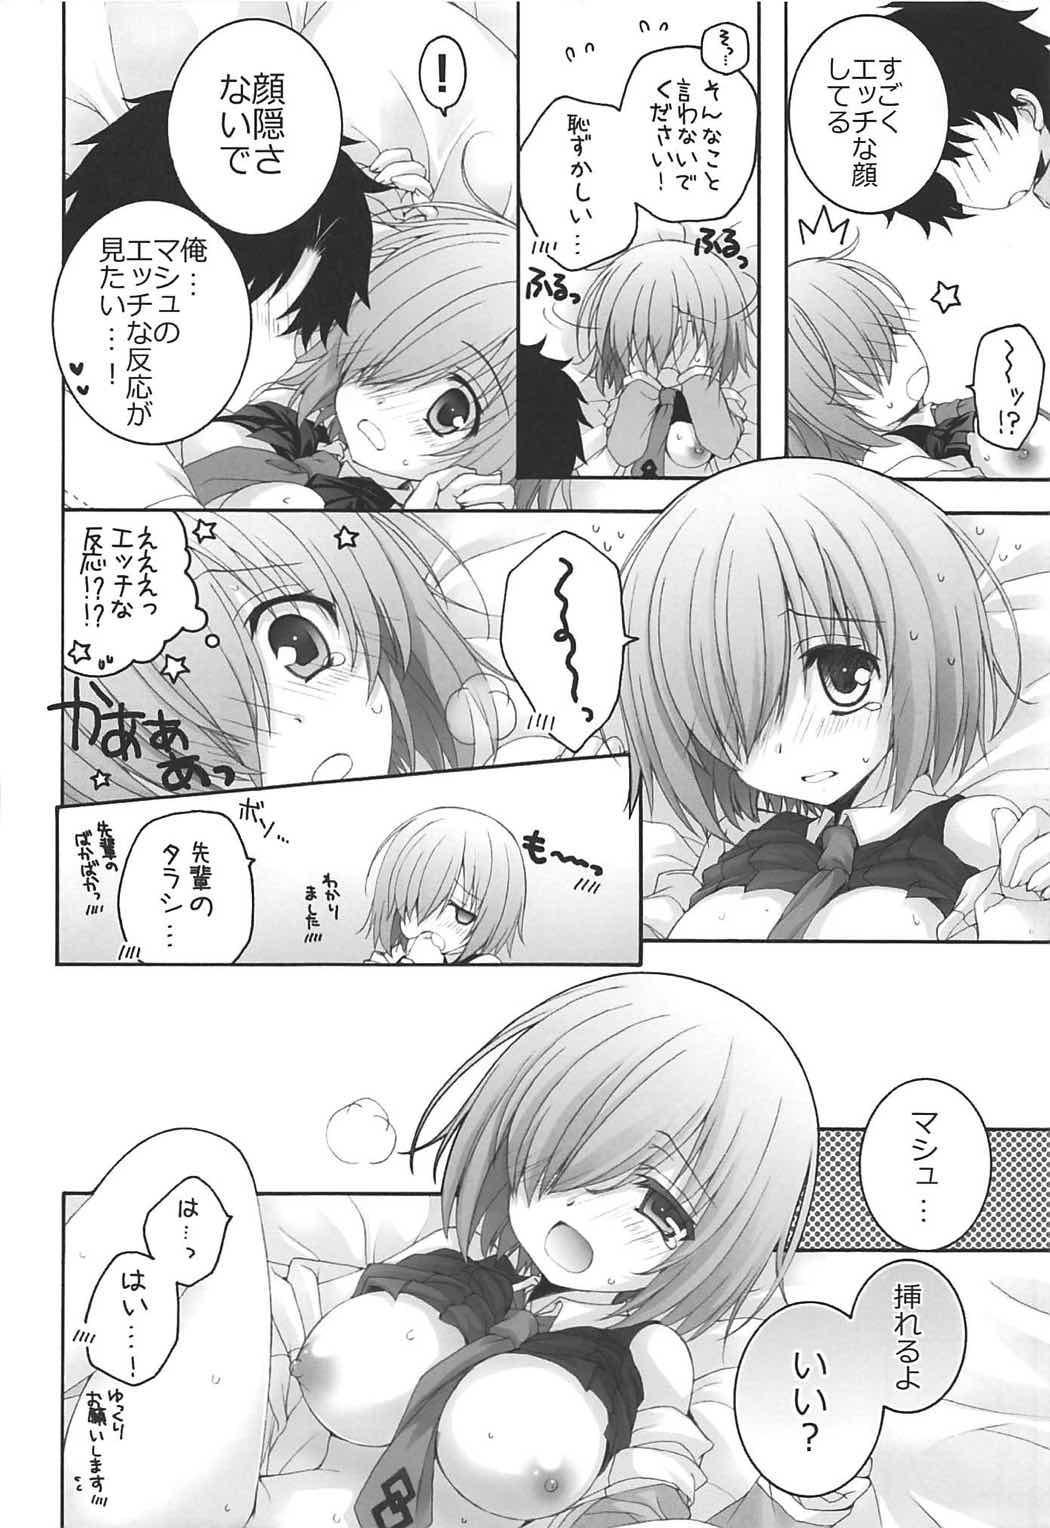 (COMIC1☆11) [Pyonpyororin (Akoko.)] - 1 day ago - (Fate/Grand Order) 14